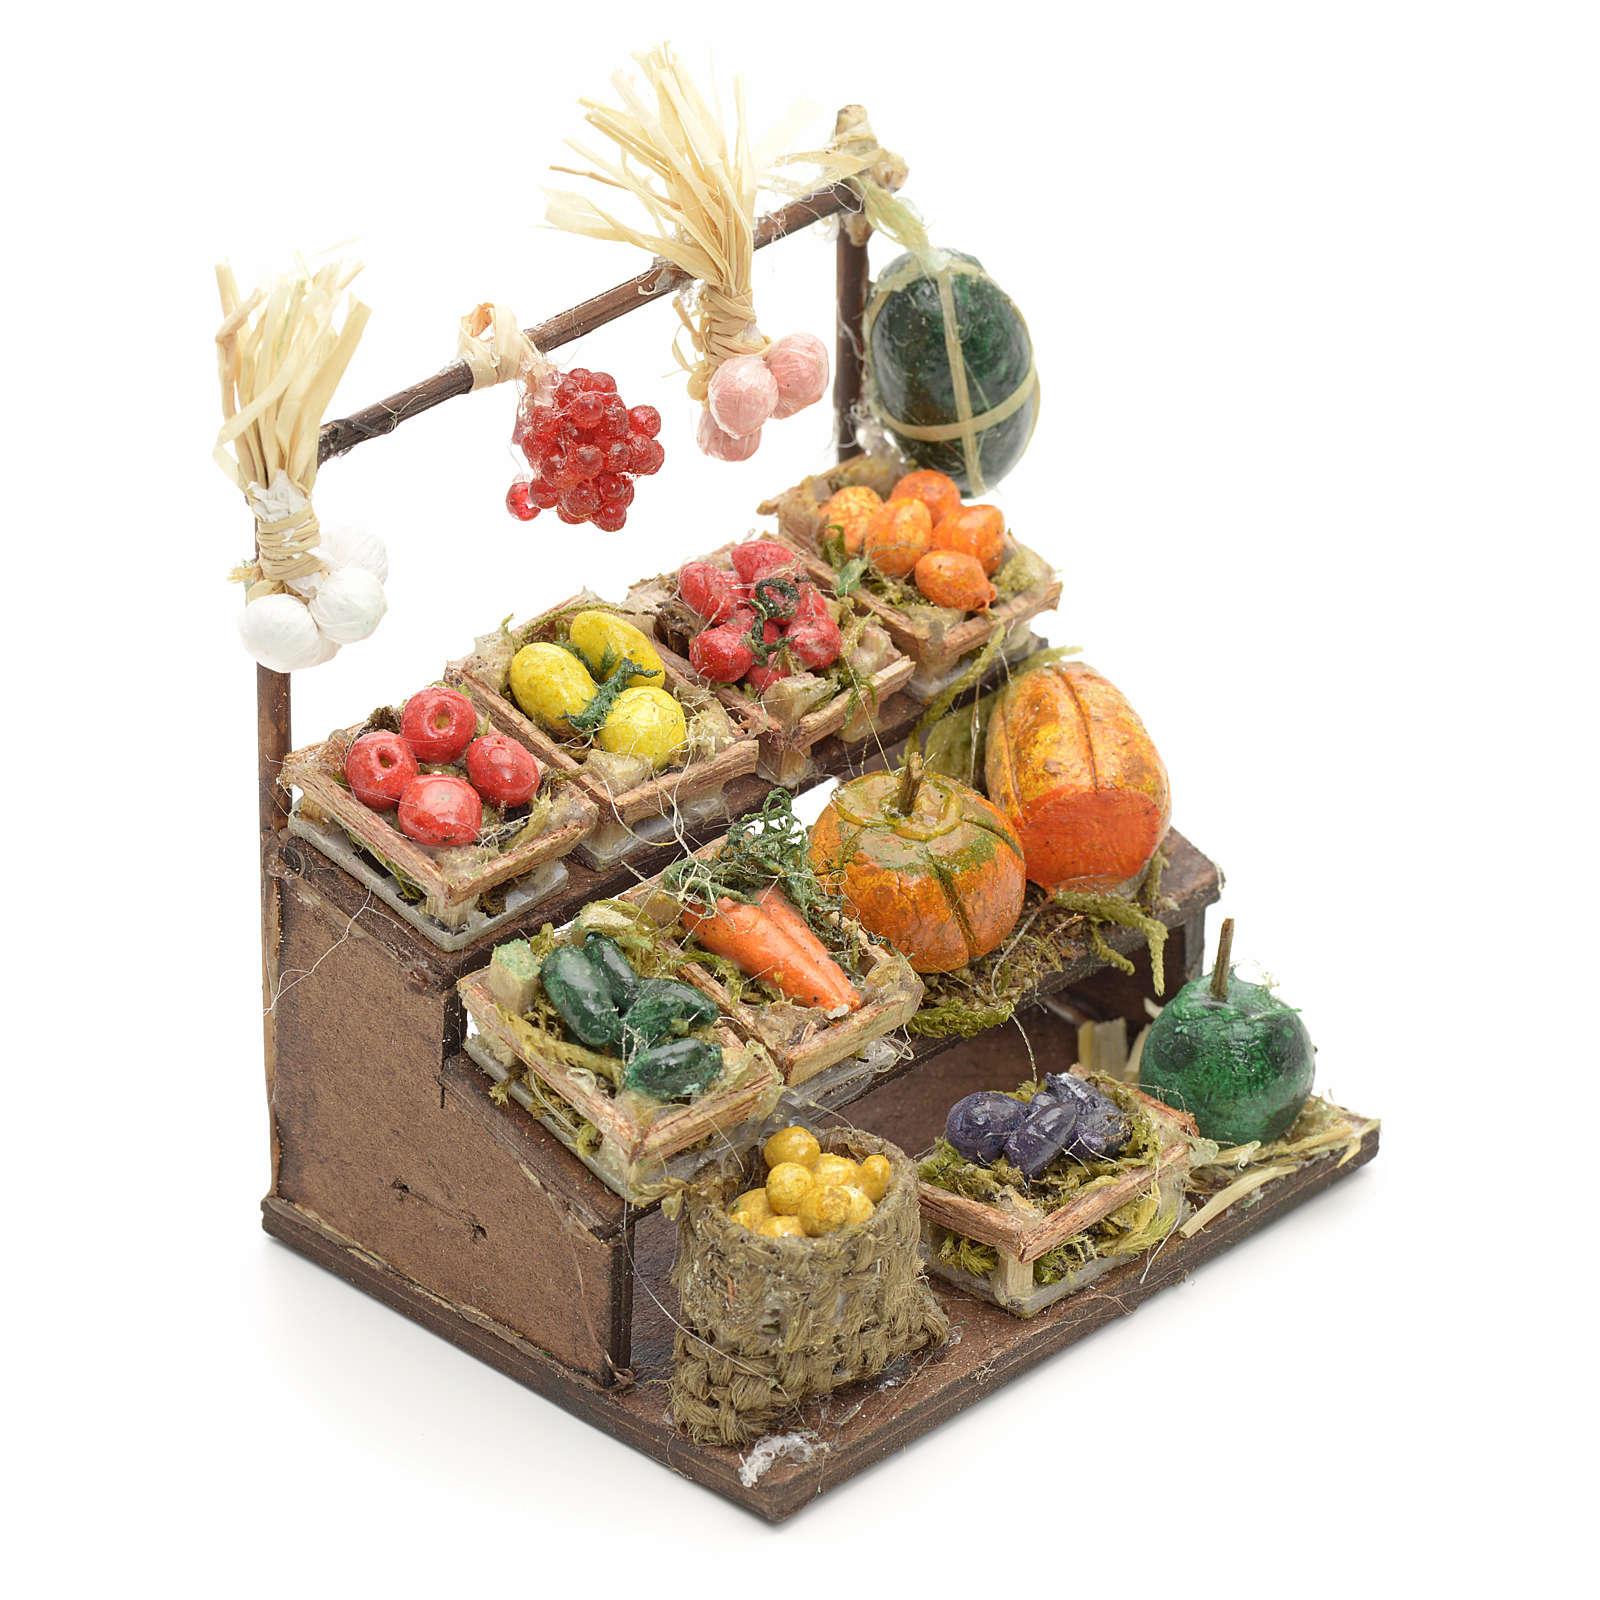 Banco frutta presepe napoletano cm 8 4